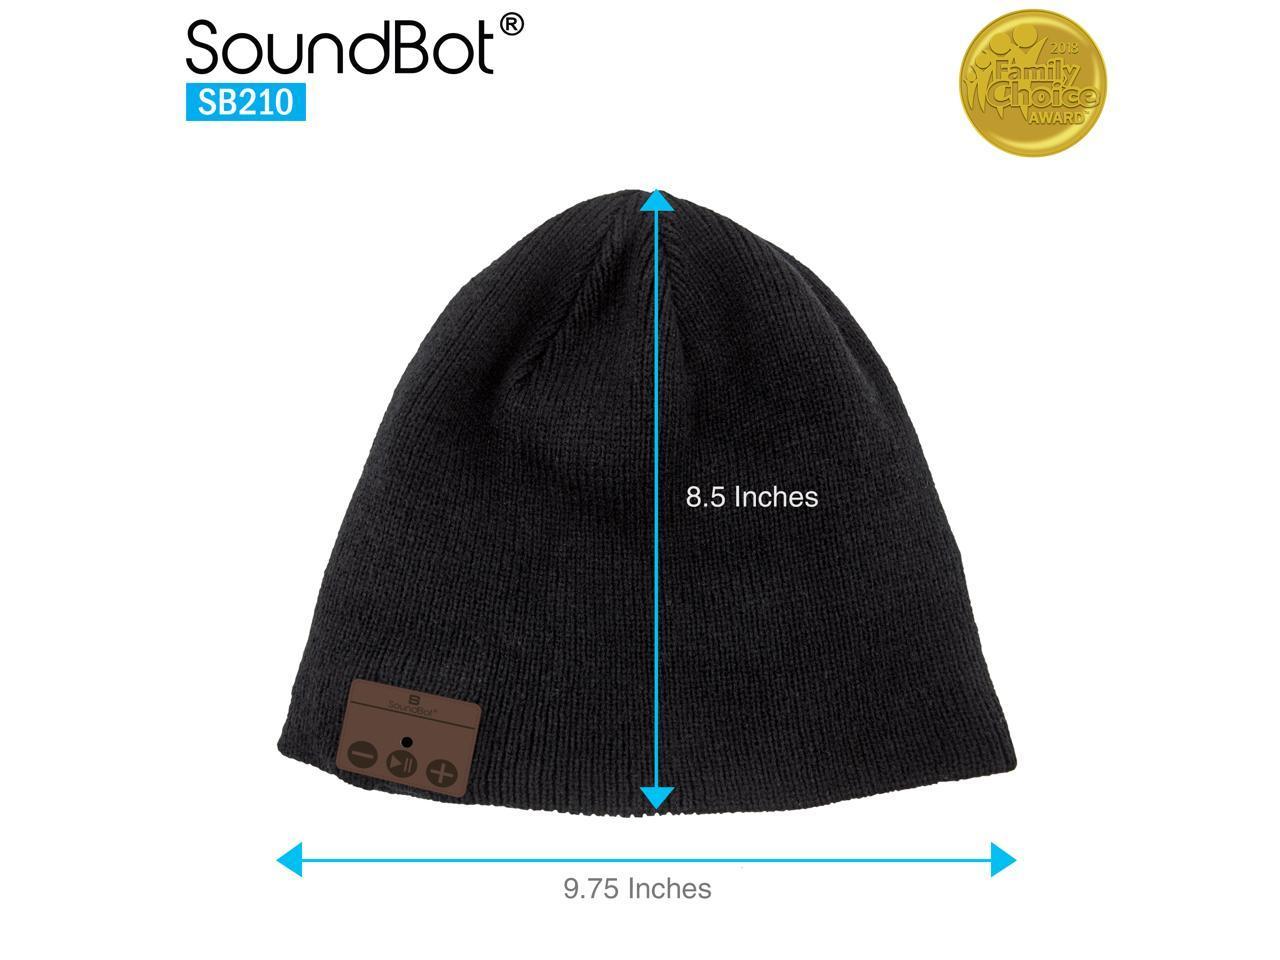 Built-in Mic SoundBot Weave HD Stereo Bluetooth 4.1 Wireless Smart Beanie Headset Musical Knit Headphone Speaker Hat Speakerphone Cap w// 5Hrs Music Streaming /& 7Hrs Hands-Free Talking 60Hrs Standby